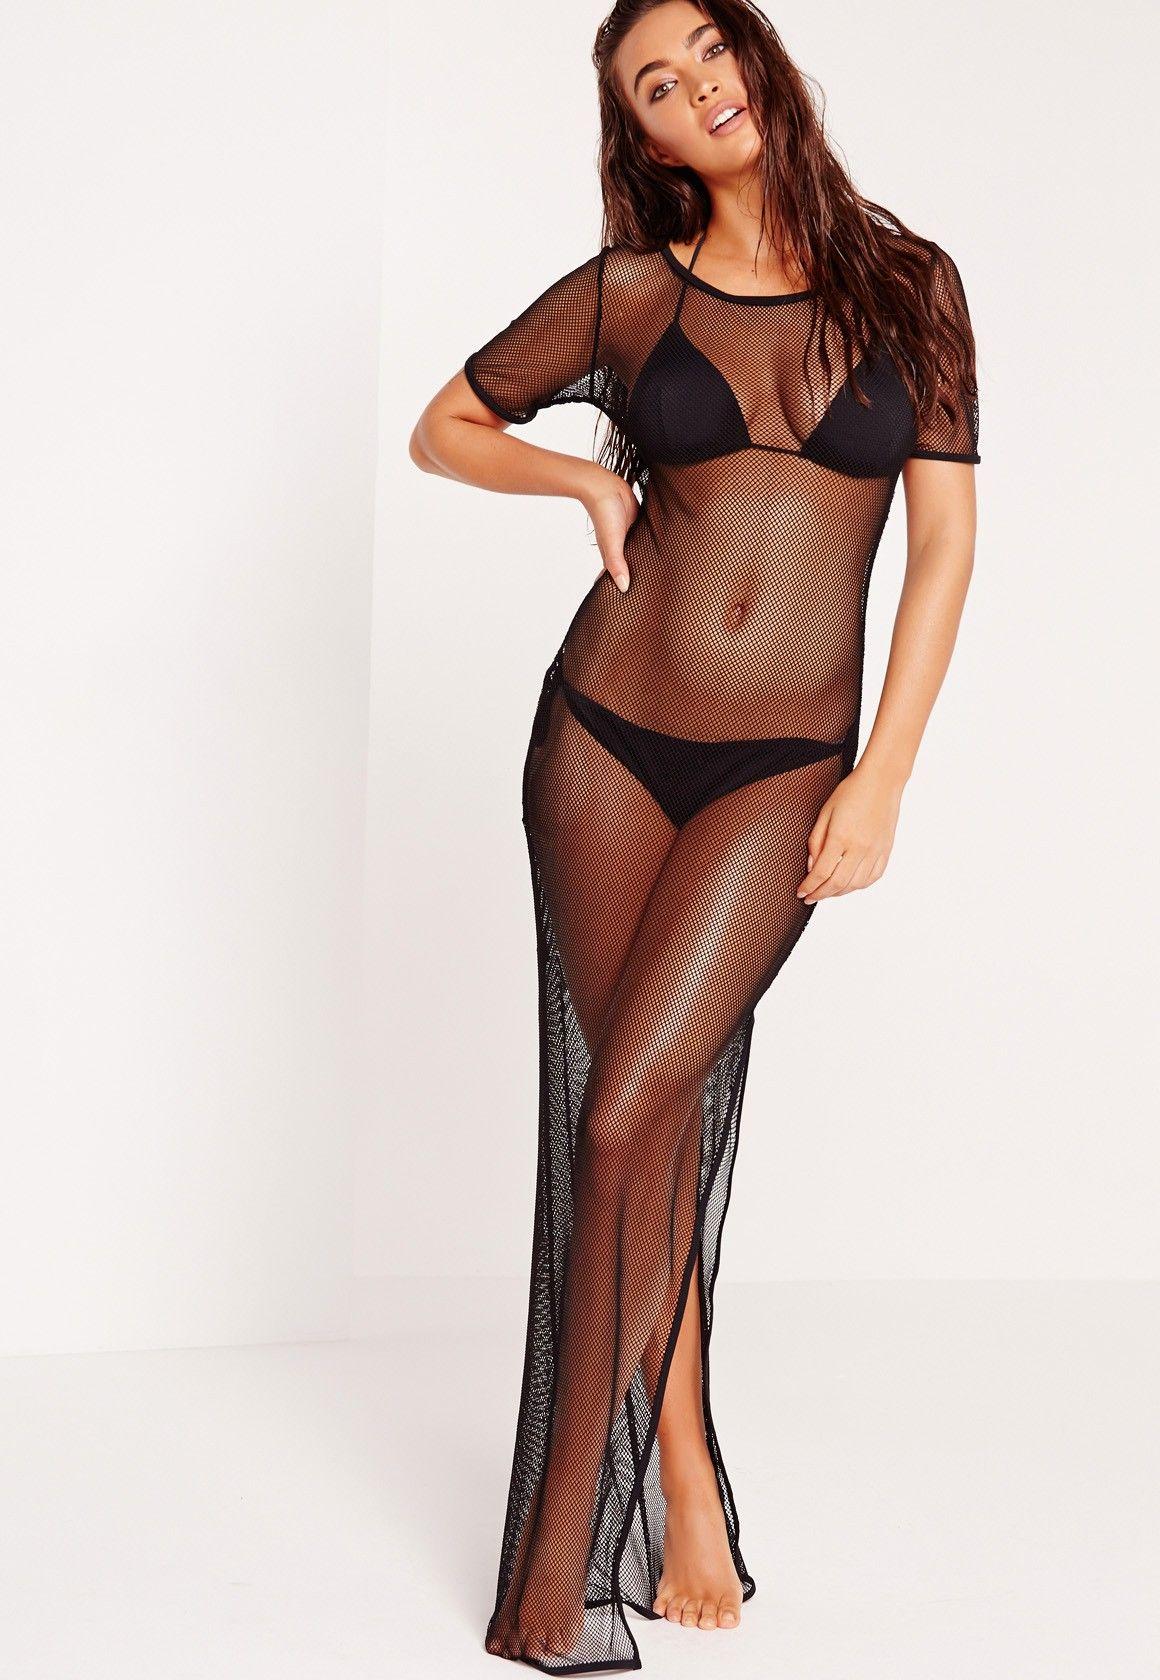 fdf7d450d7 Missguided - ABAD x Missguided Fishnet Beach Maxi Dress Black ...